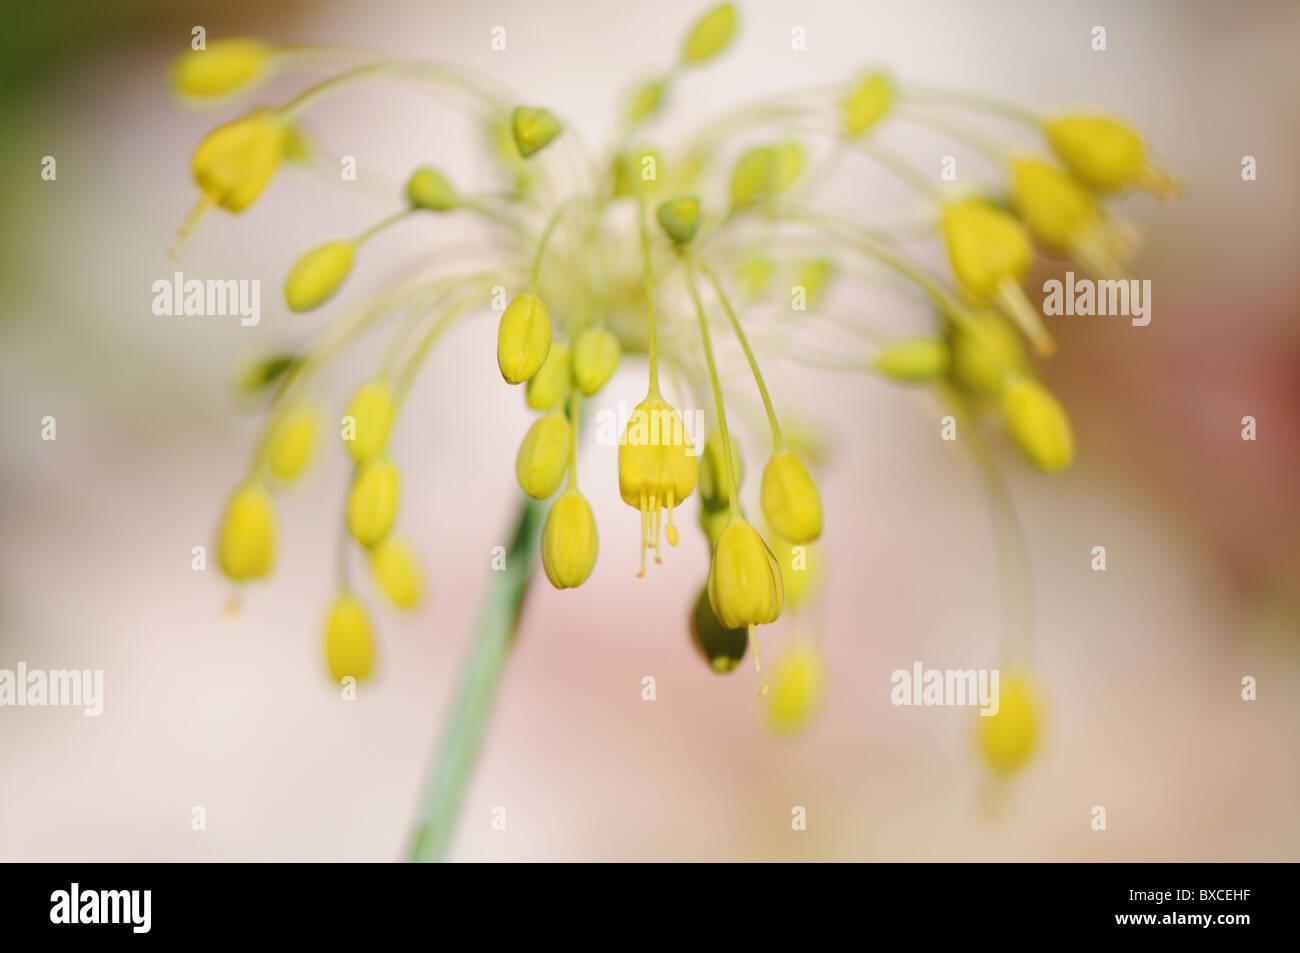 Allium Flavum - yellow onion flower - Stock Image